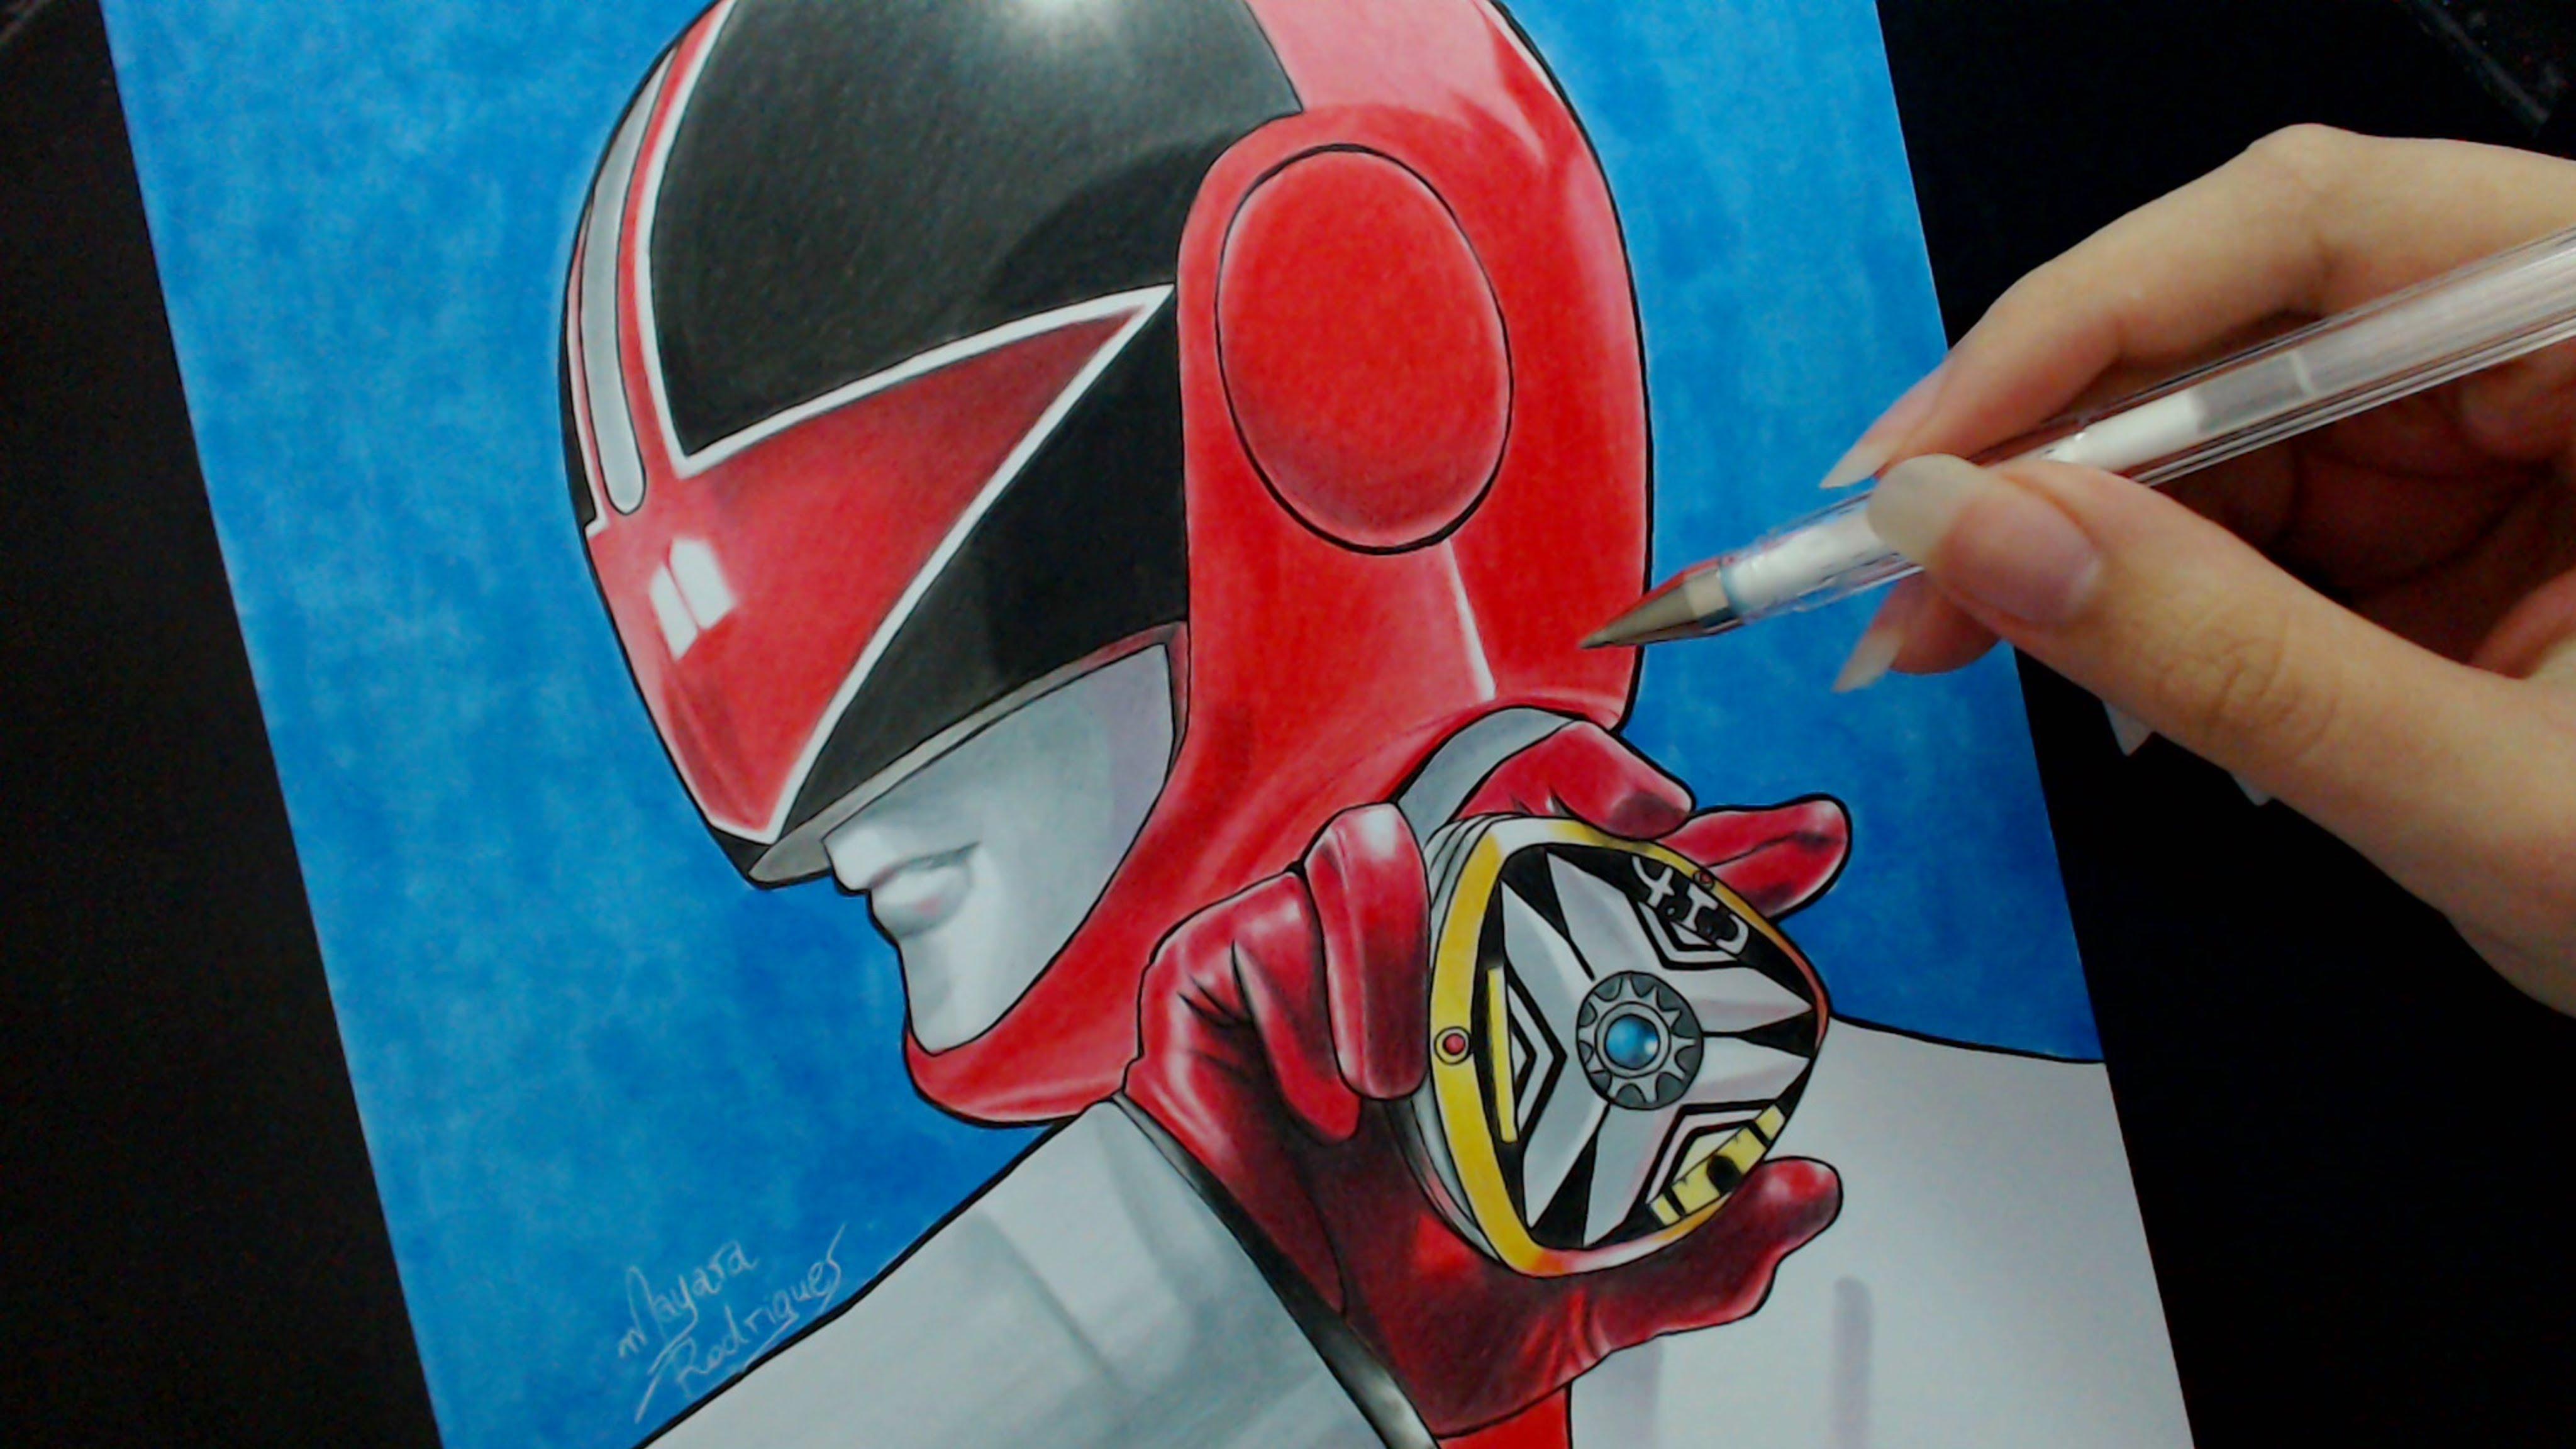 4096x2304 Speed Drawing